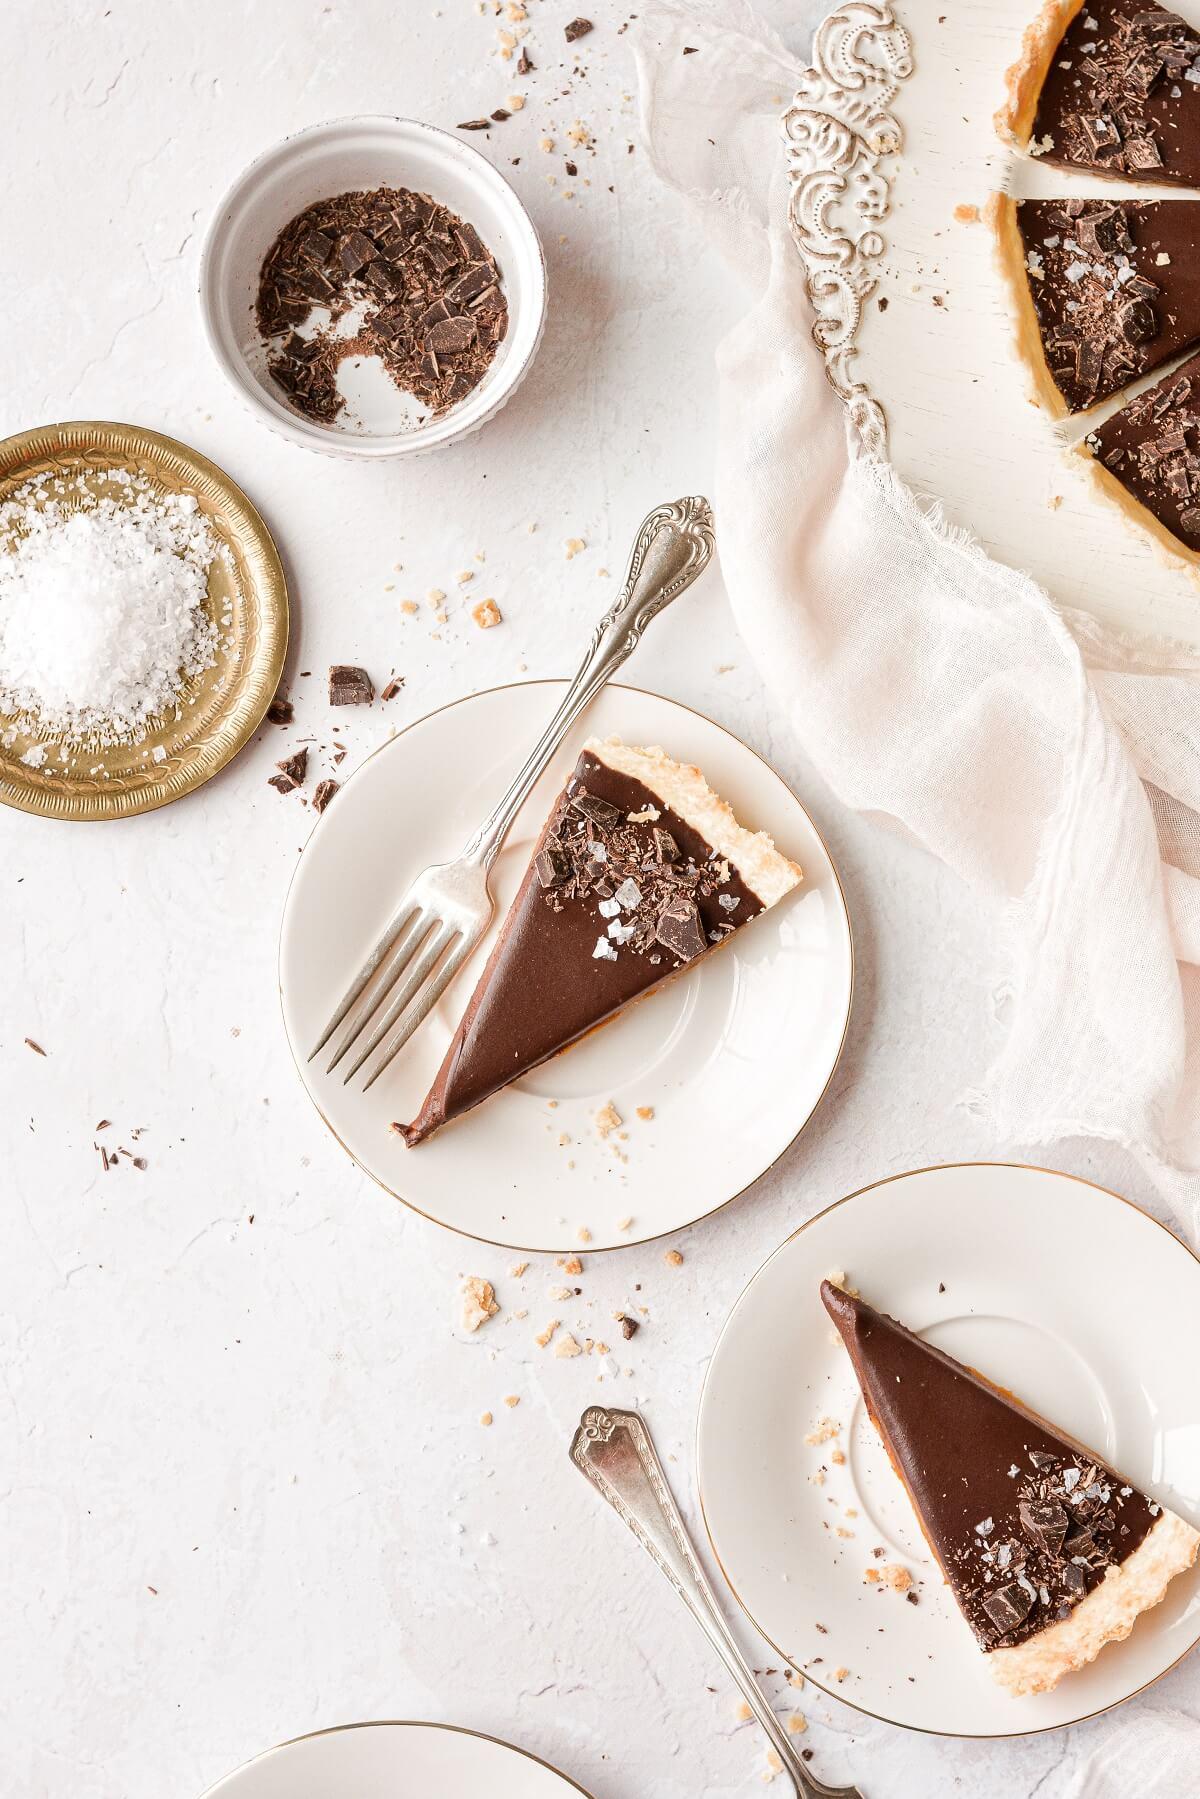 Slices of chocolate caramel tart on white plates.